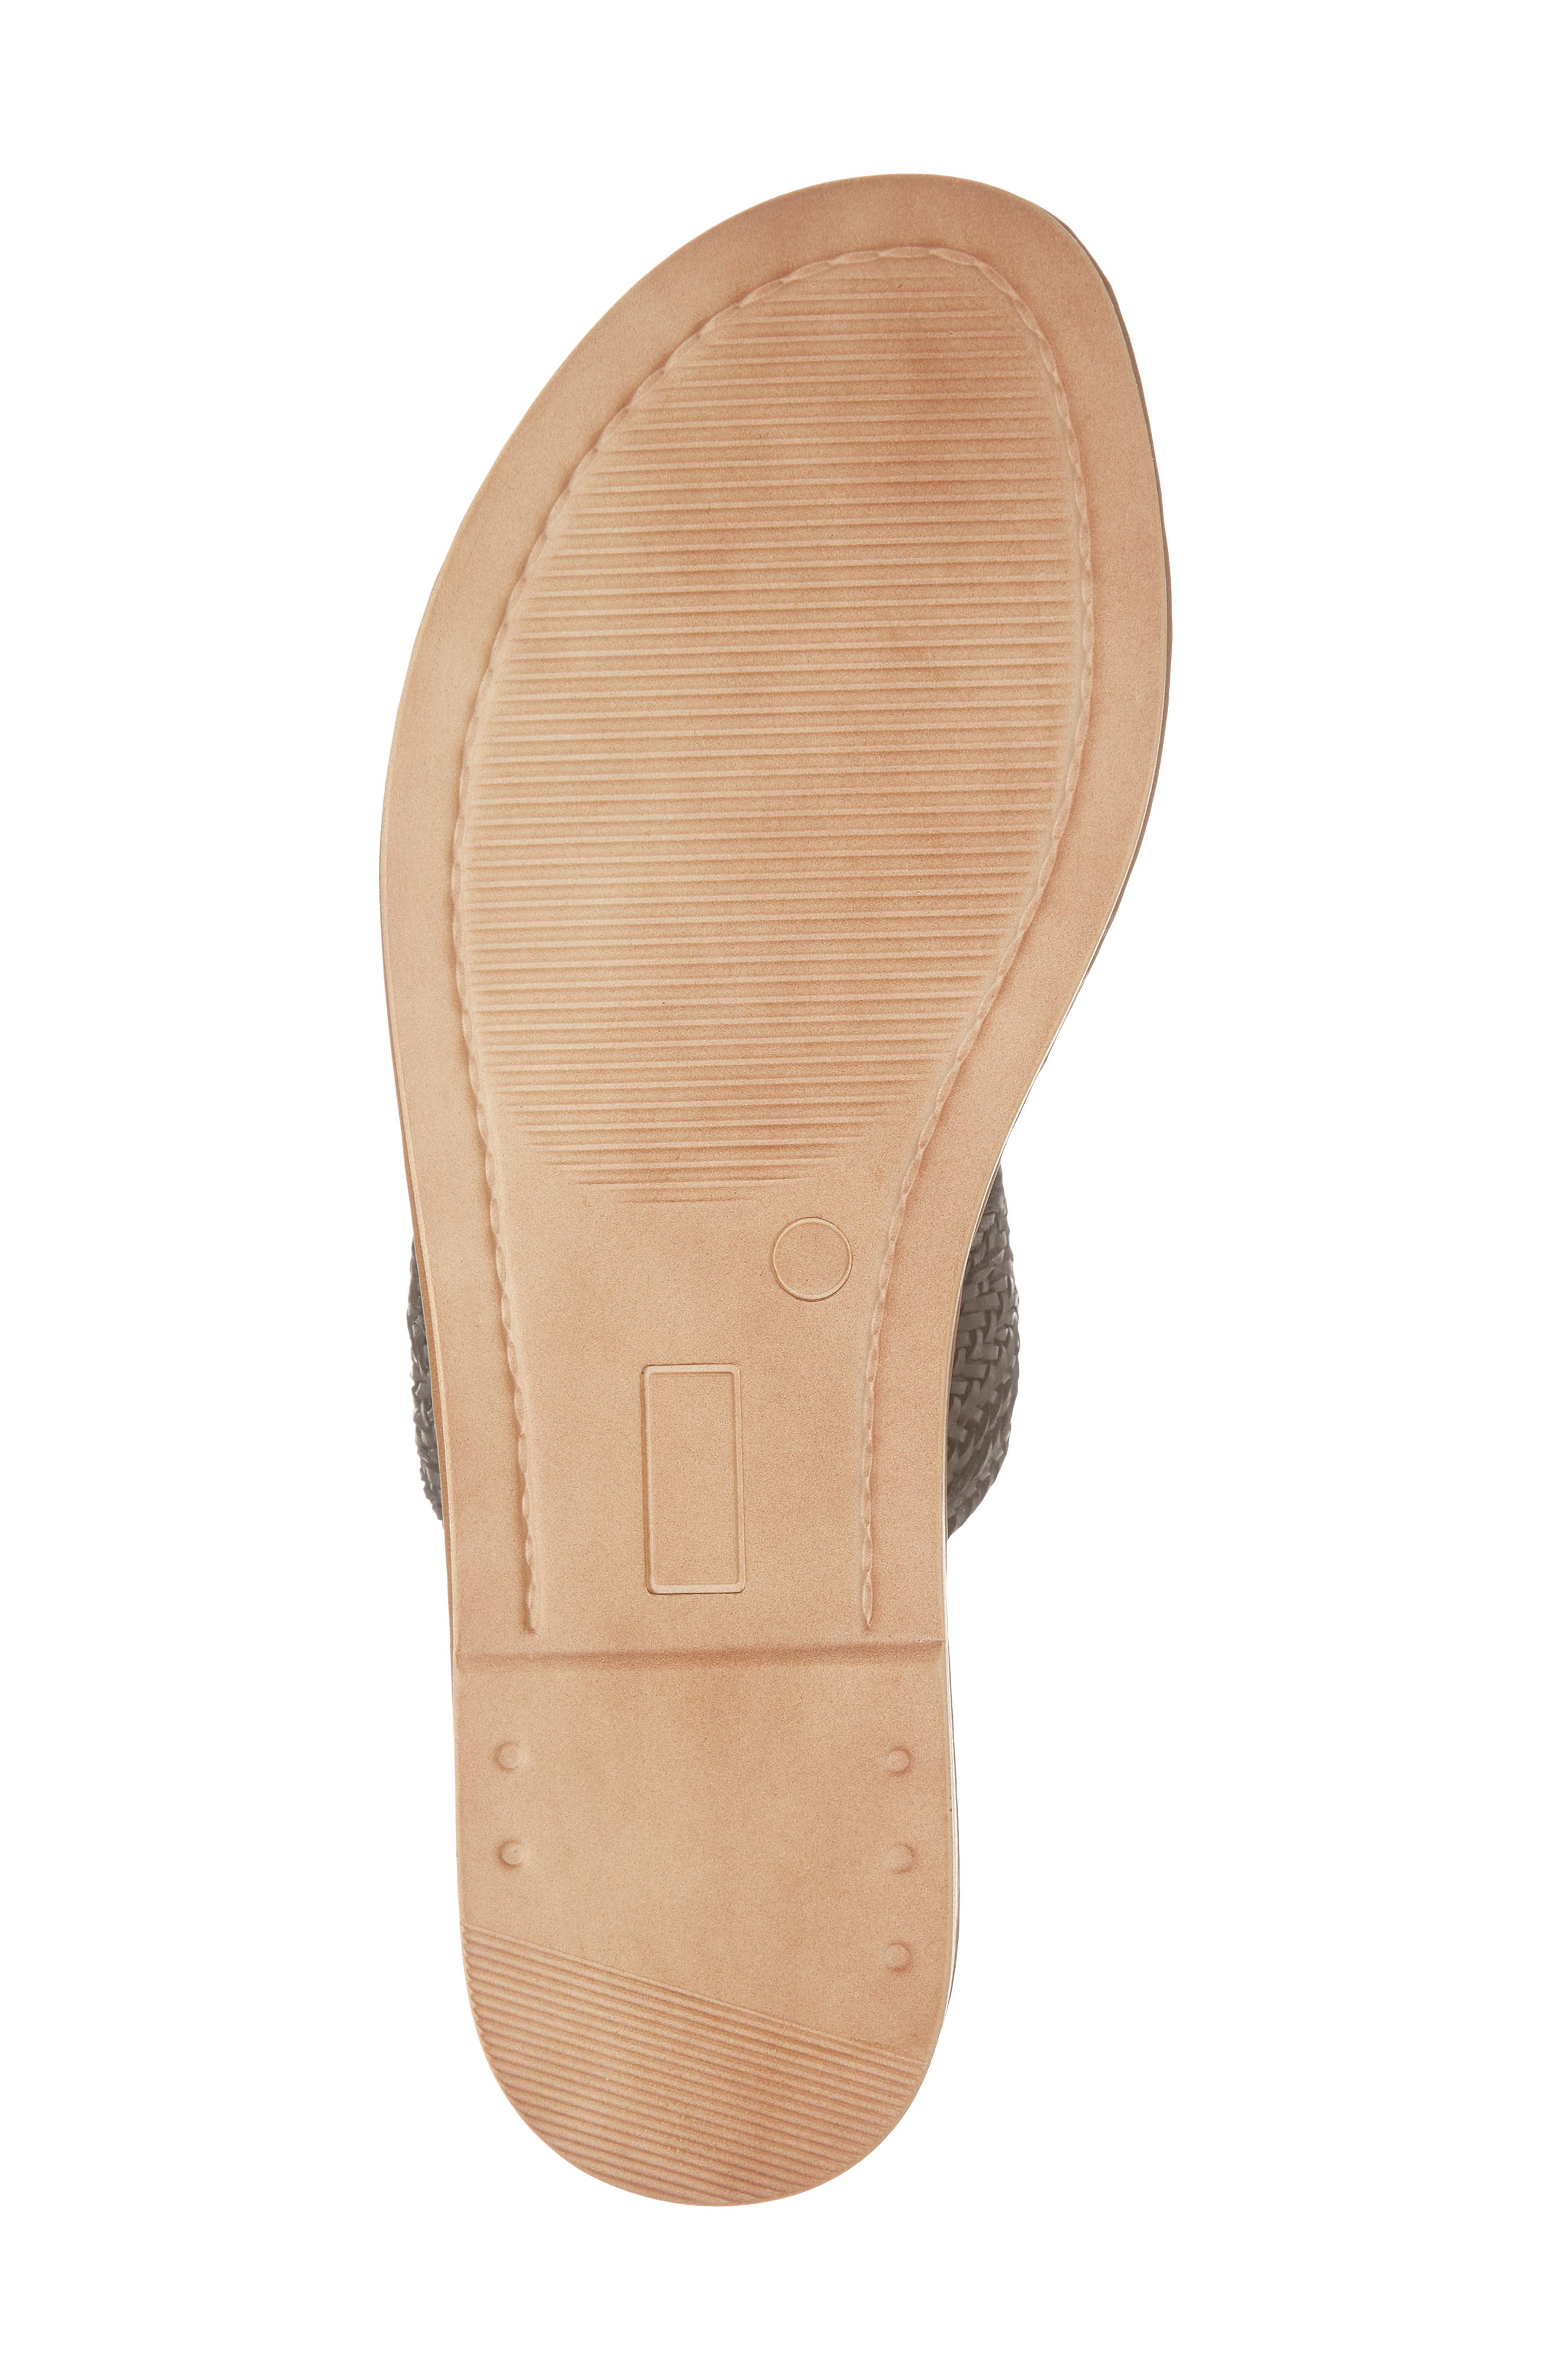 BELLA VITA, Two-Strap Slide Sandal, Alternate thumbnail 6, color, BLACK WOVEN